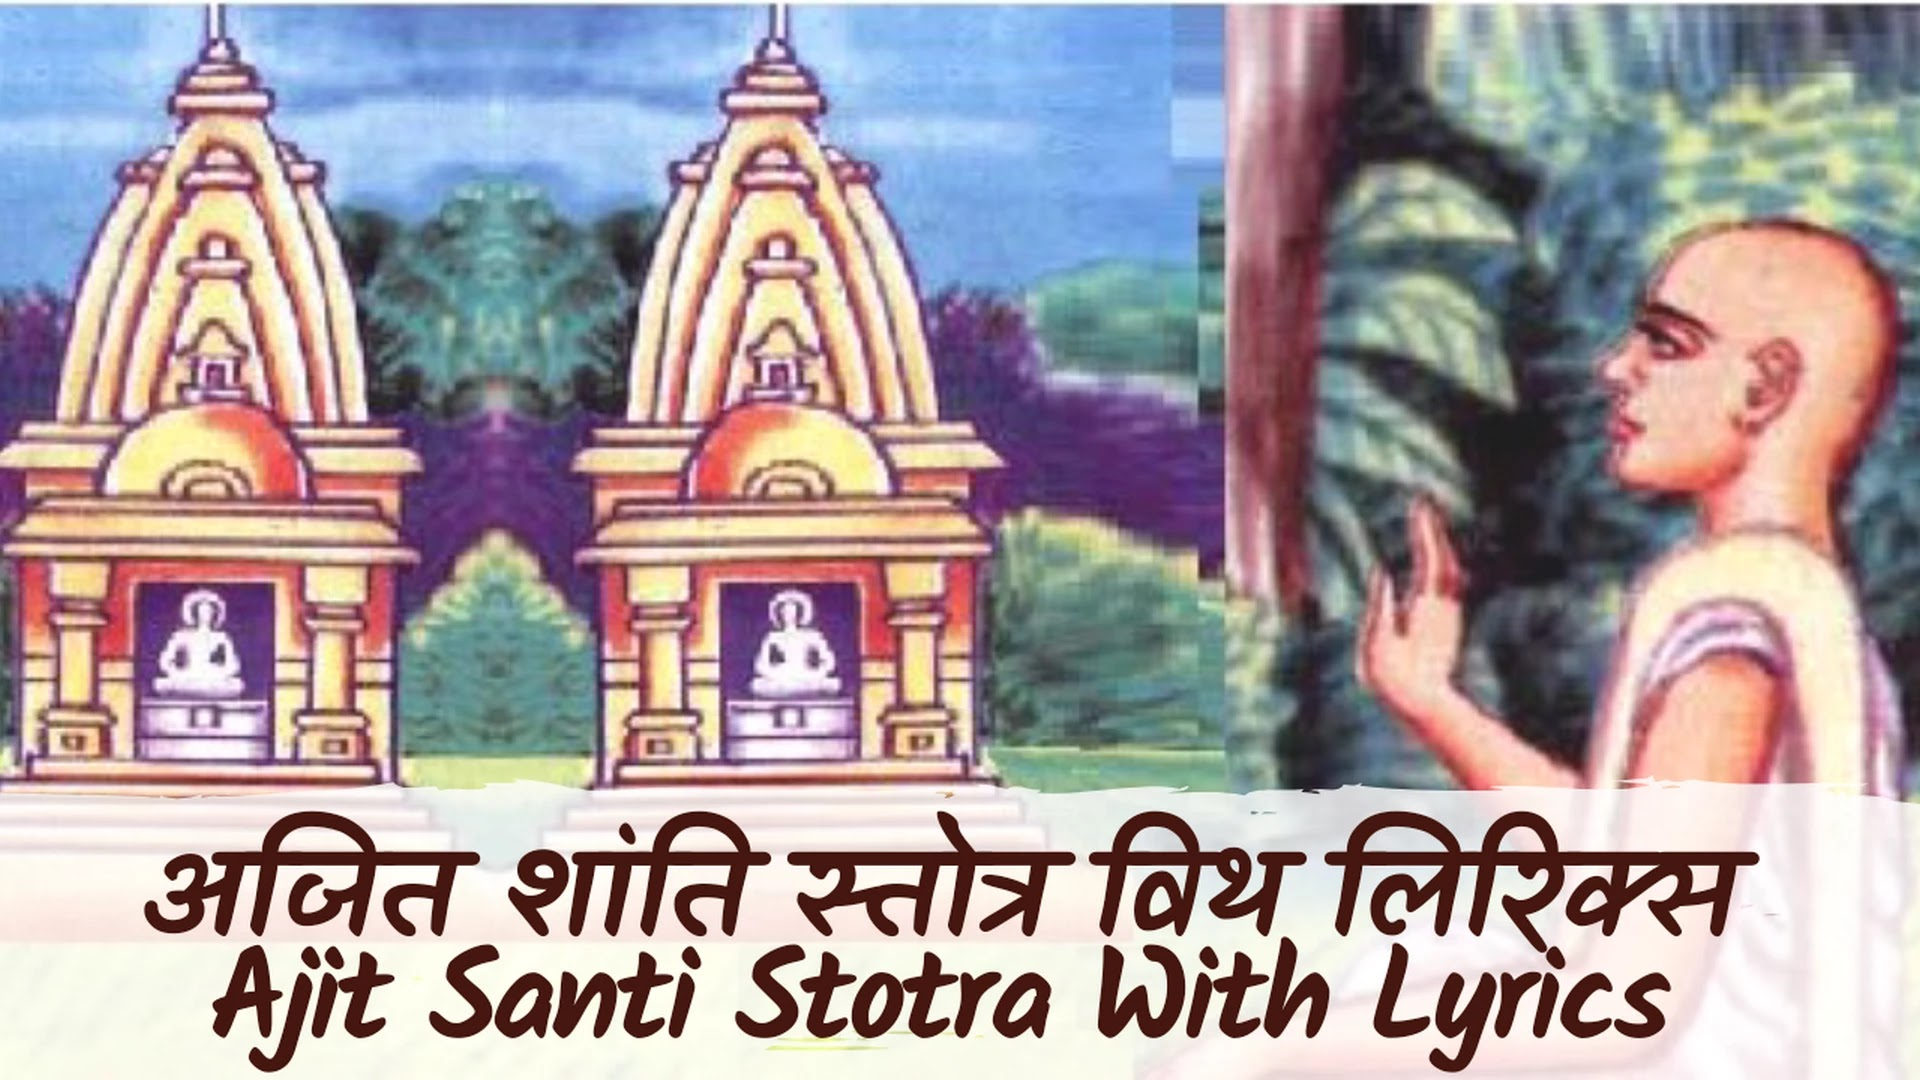 Ajit Shanti Stotra Stavan With Lyrics